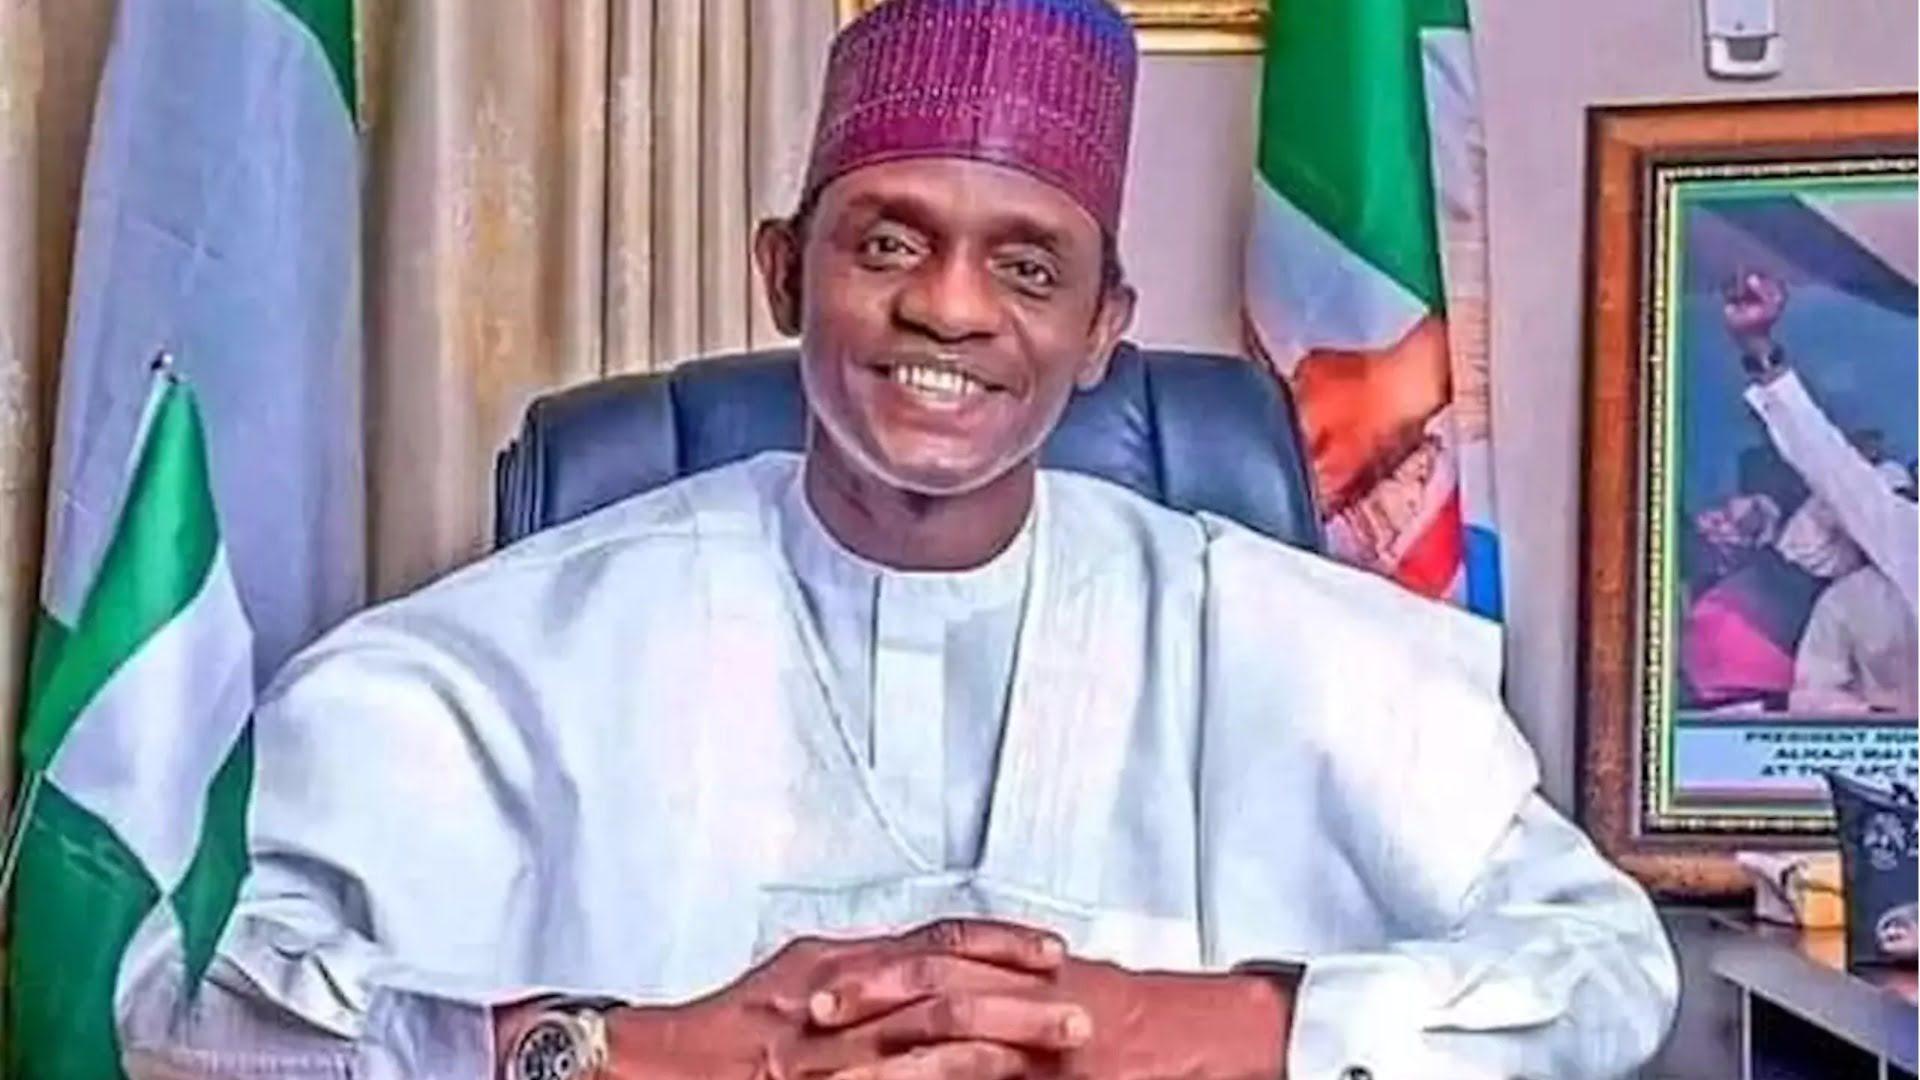 Nigeria news : Buni presents over N106.9 billion as 2021 budget estimate